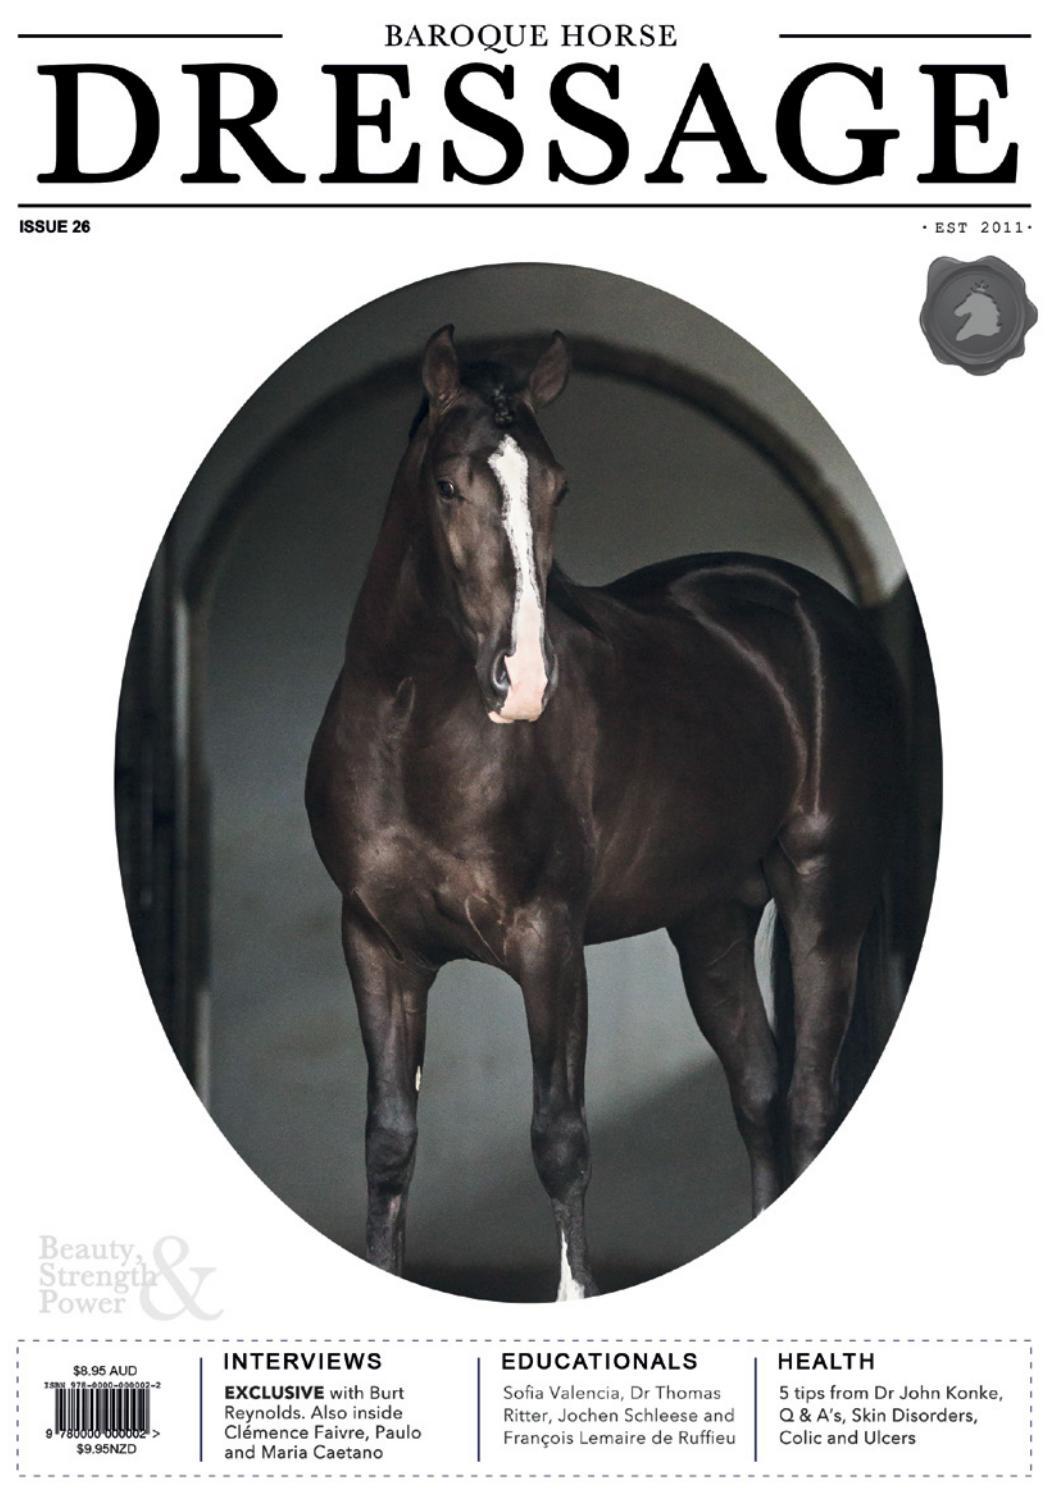 Baroque Horse DRESSAGE Issue 27   Horse dressage, Dressage